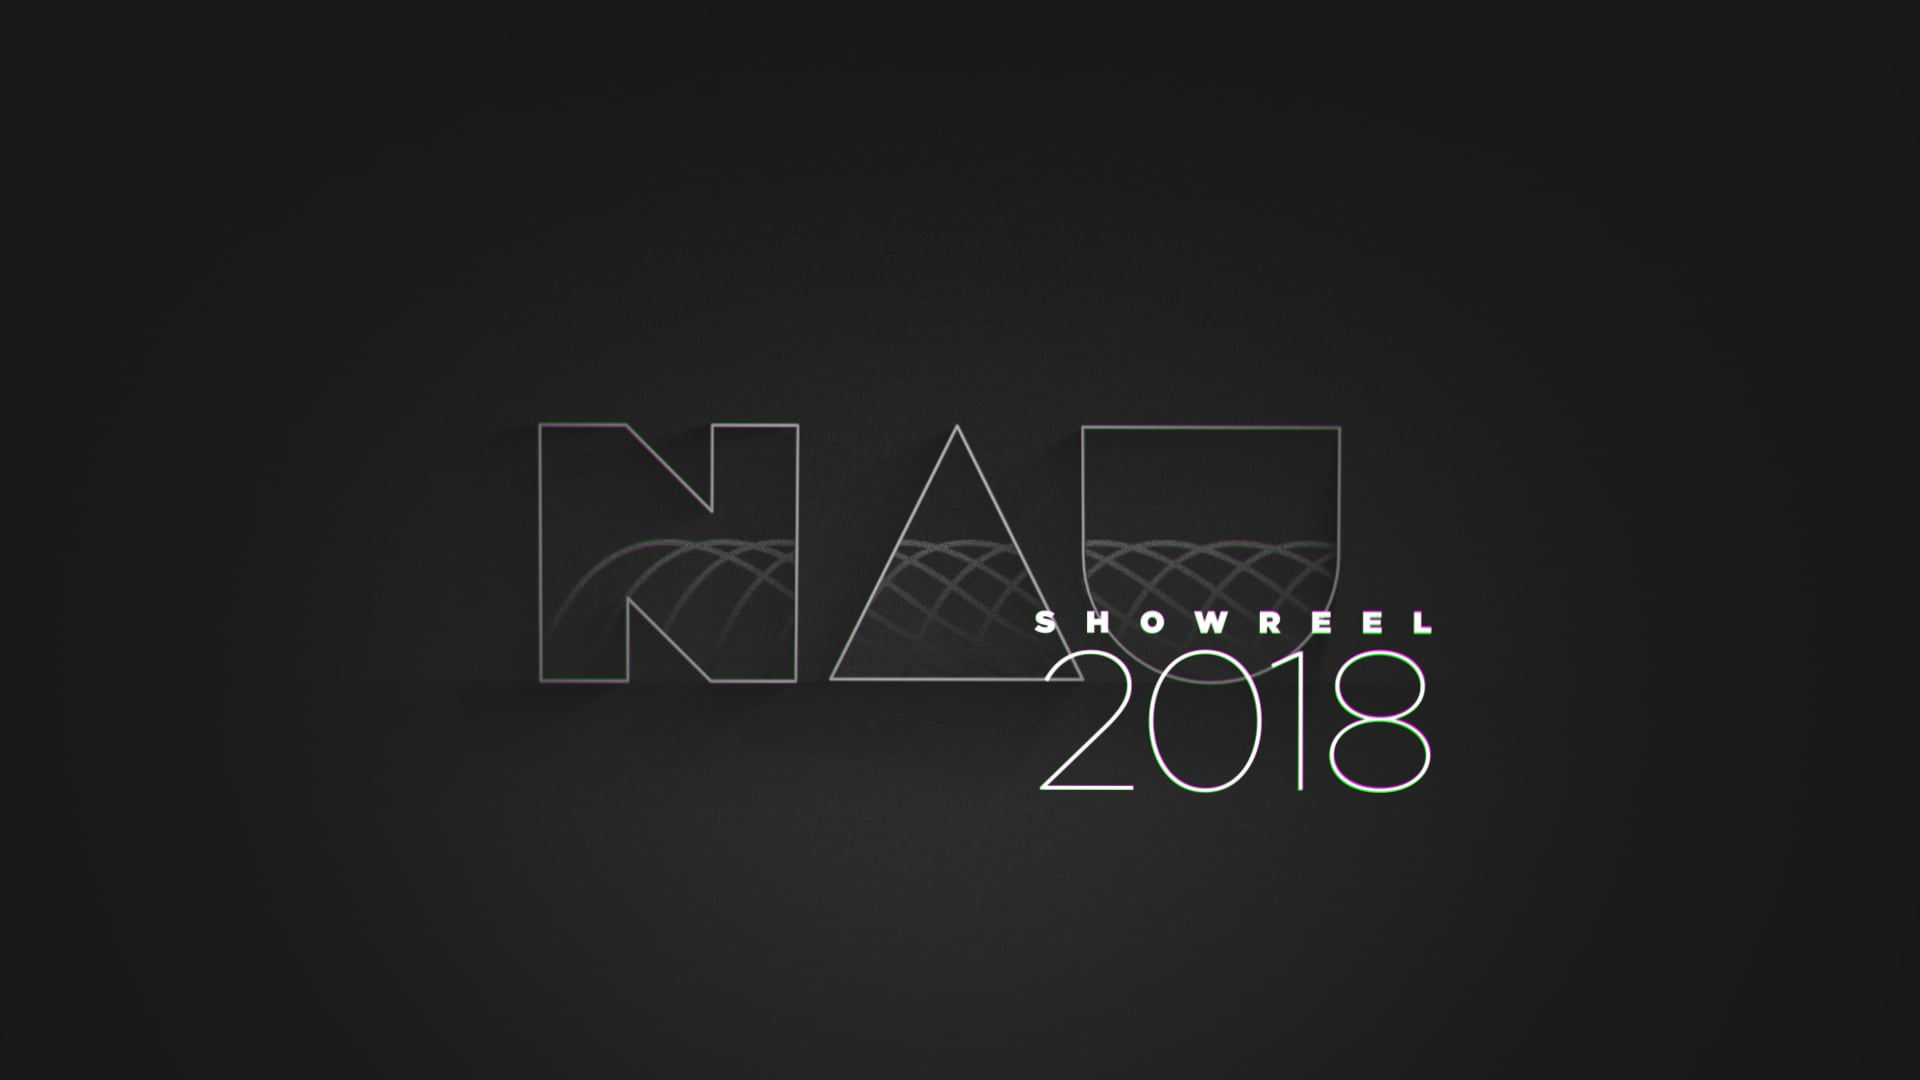 ShowReel 2018 - Guilherme Nau